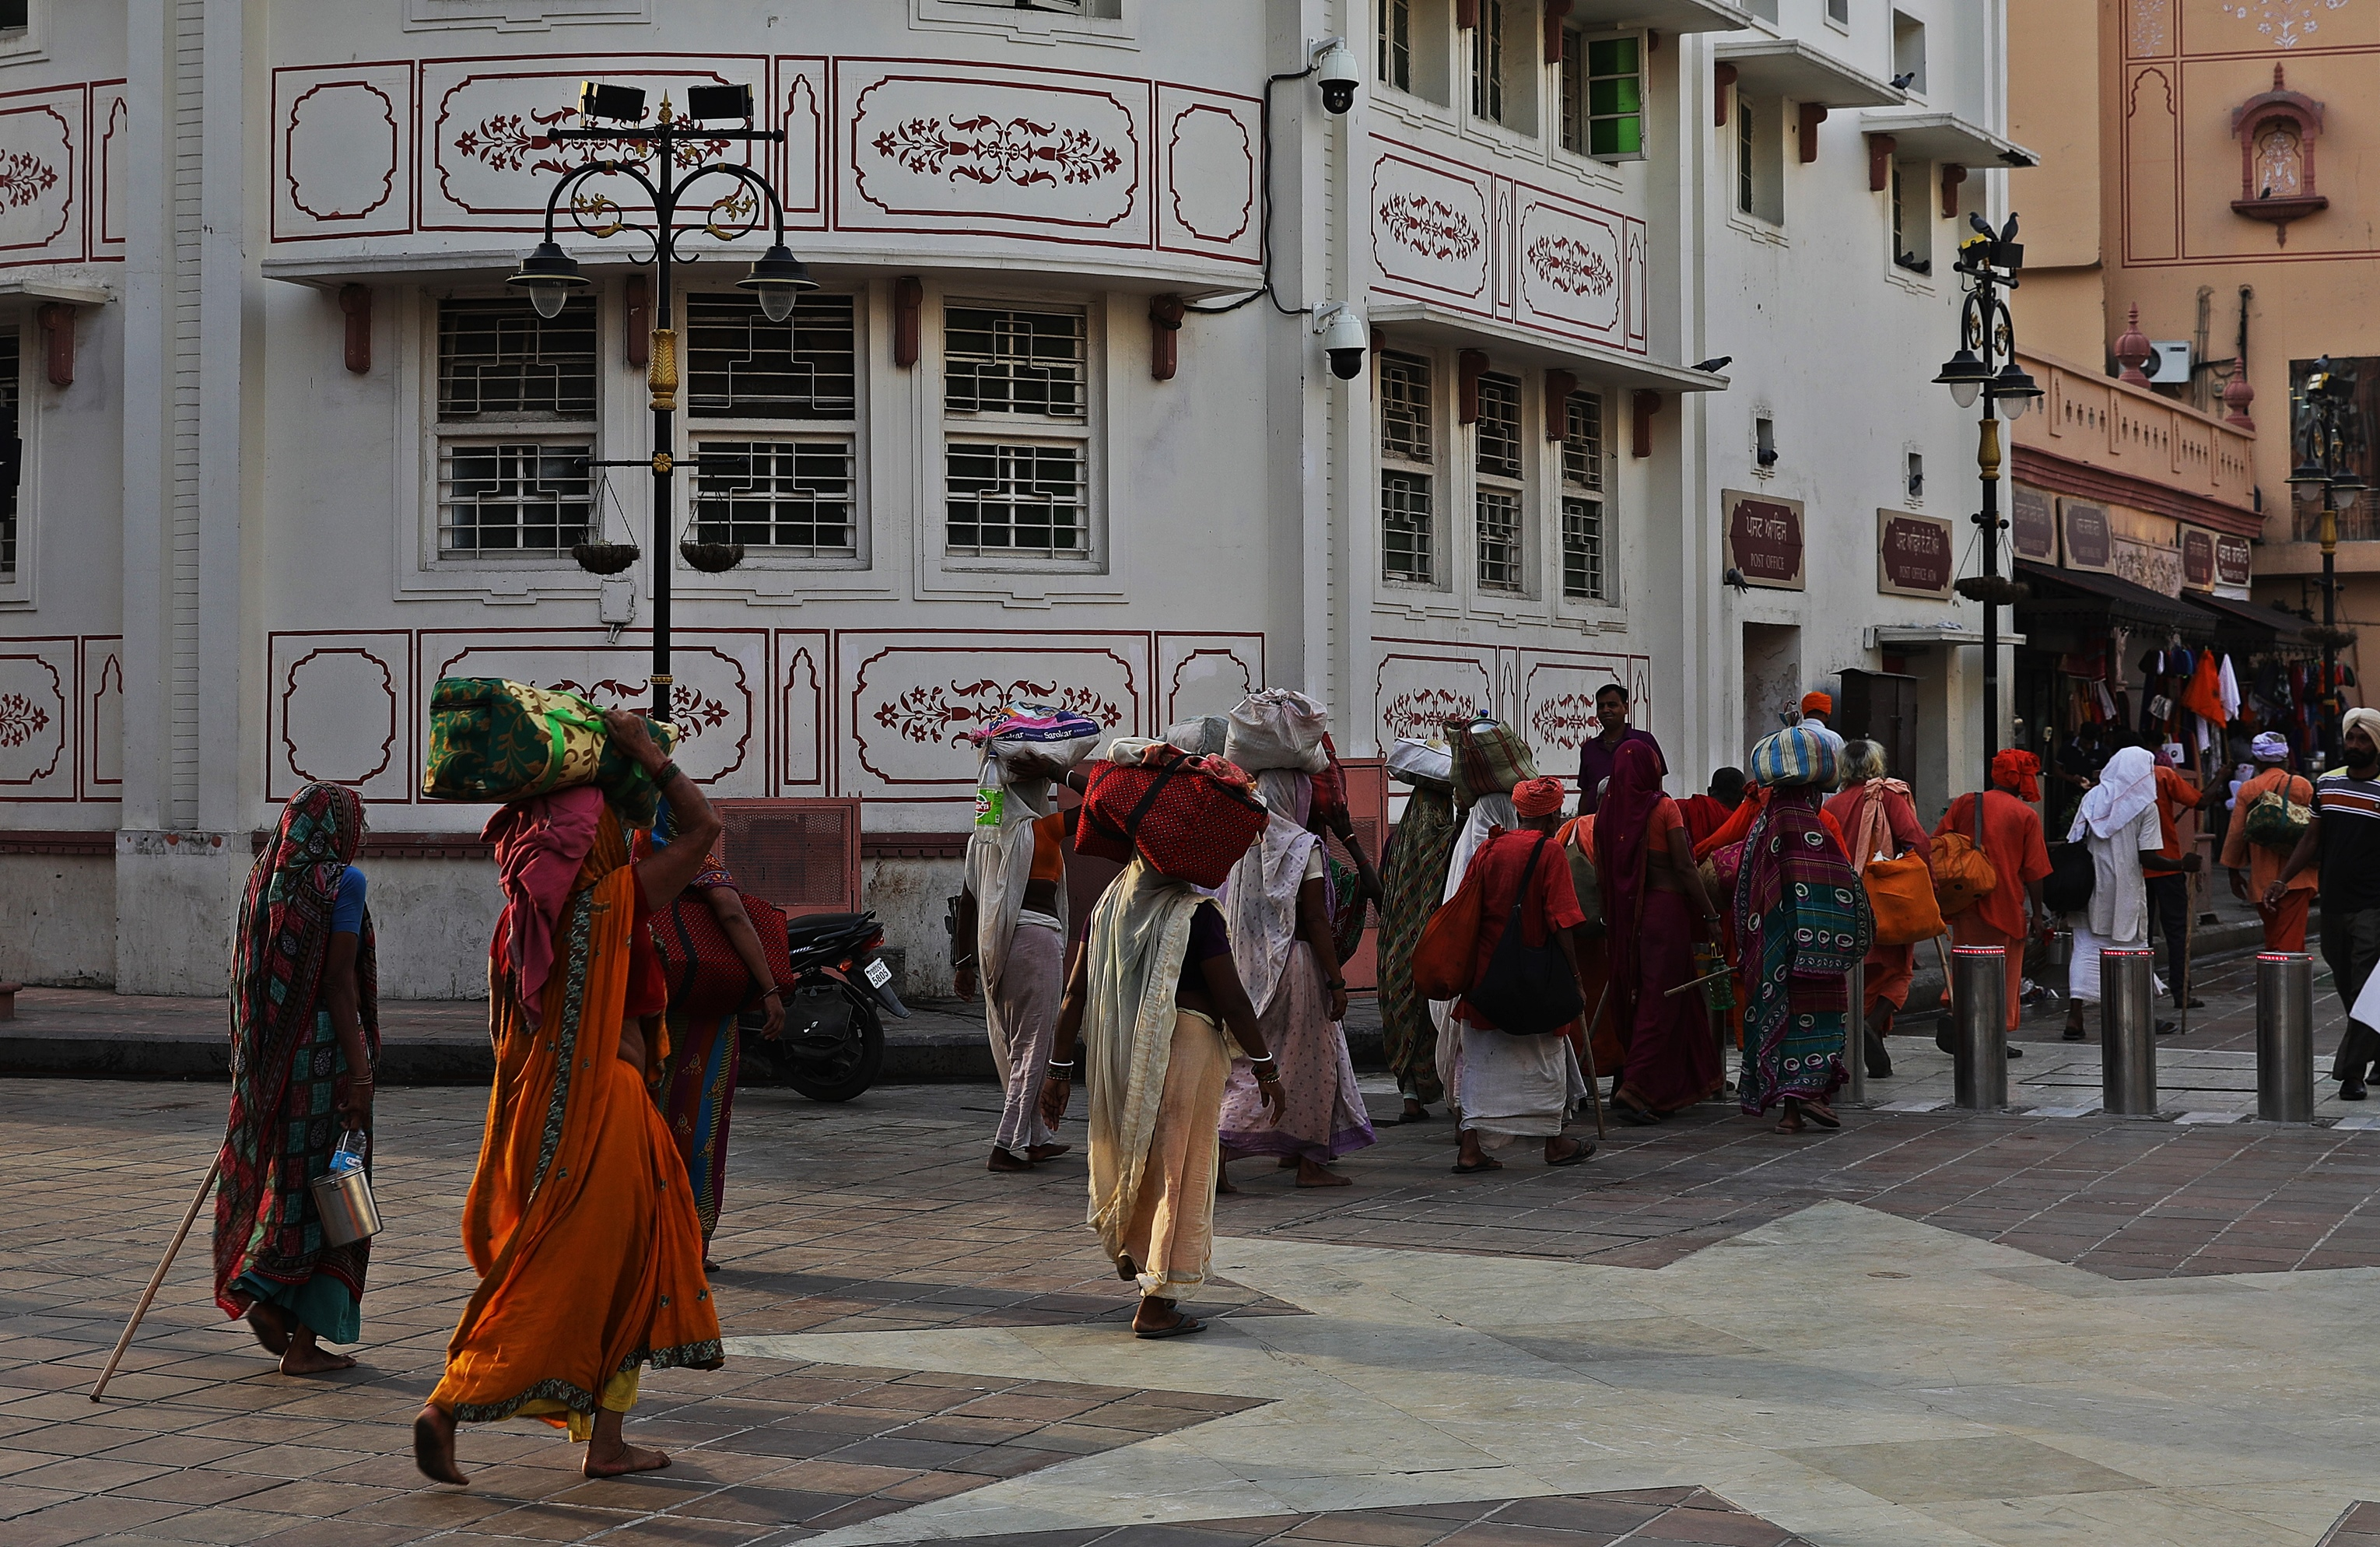 Pilgrims walking along Heritage Street to the Golden Temple